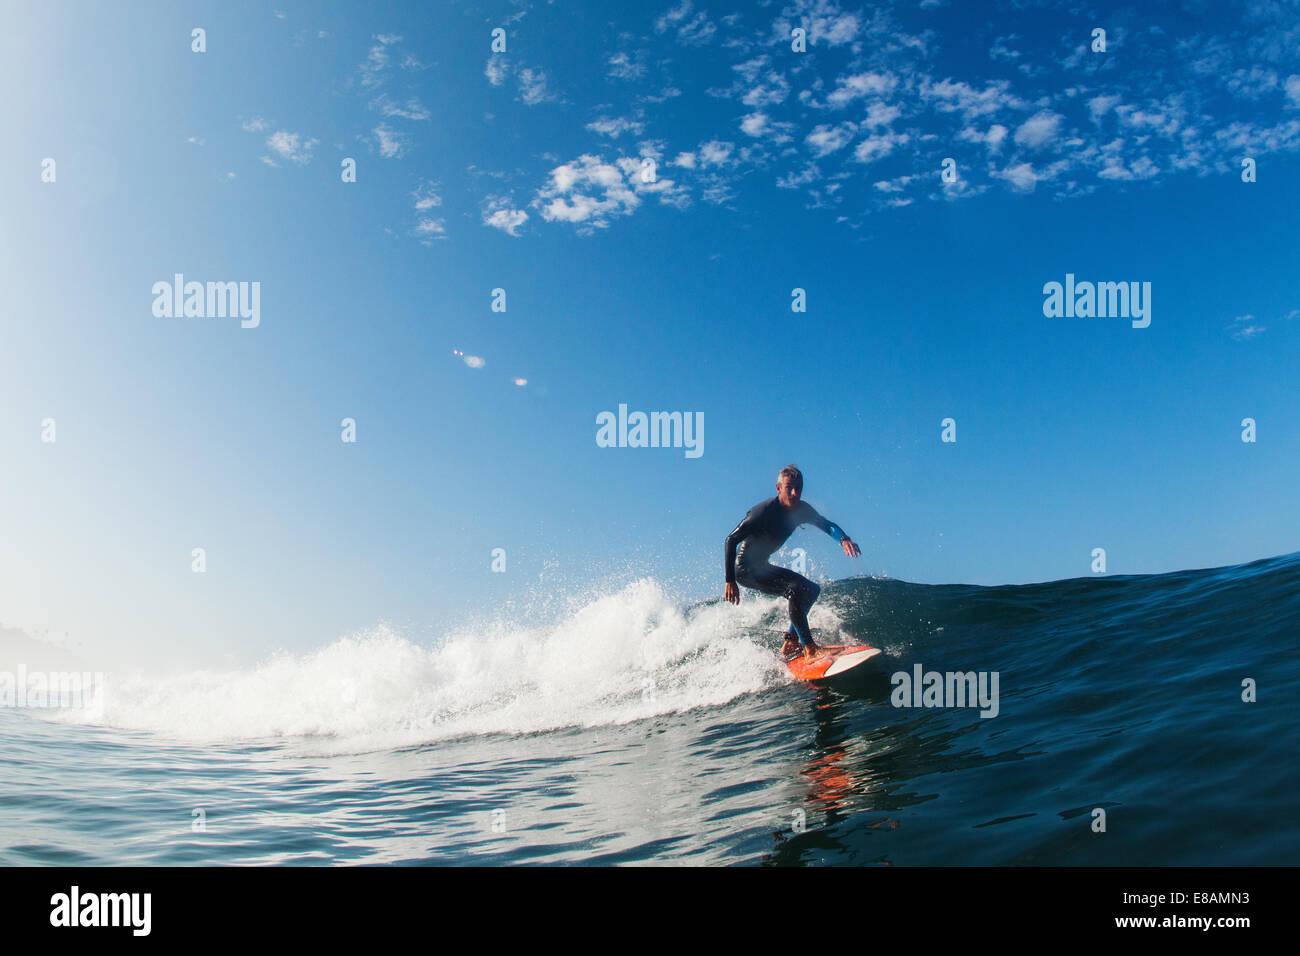 Mid adult man surfing wave, Leucadia, California, USA - Stock Image